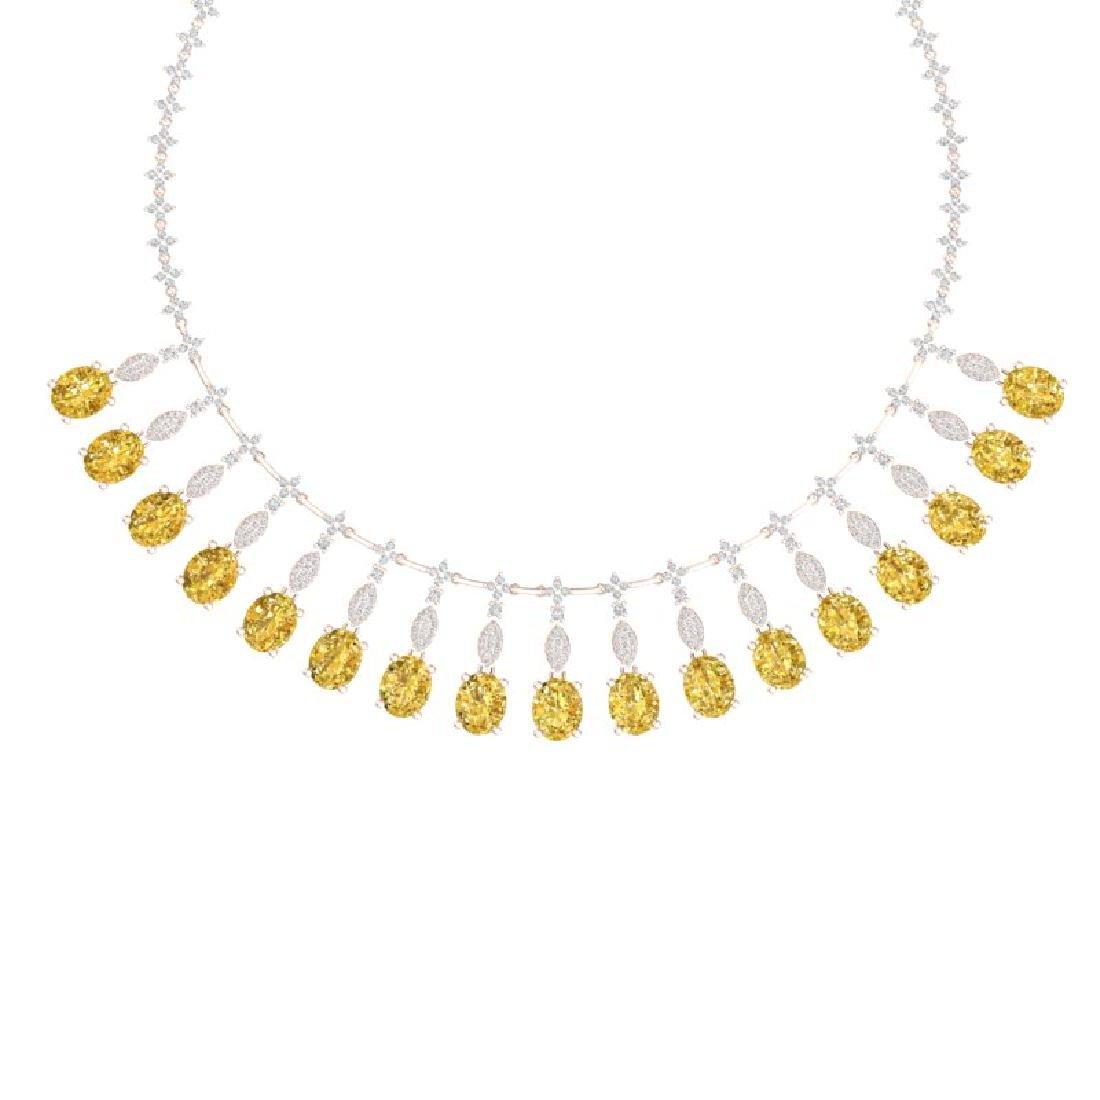 50.16 CTW Royalty Canary Citrine & VS Diamond Necklace - 2